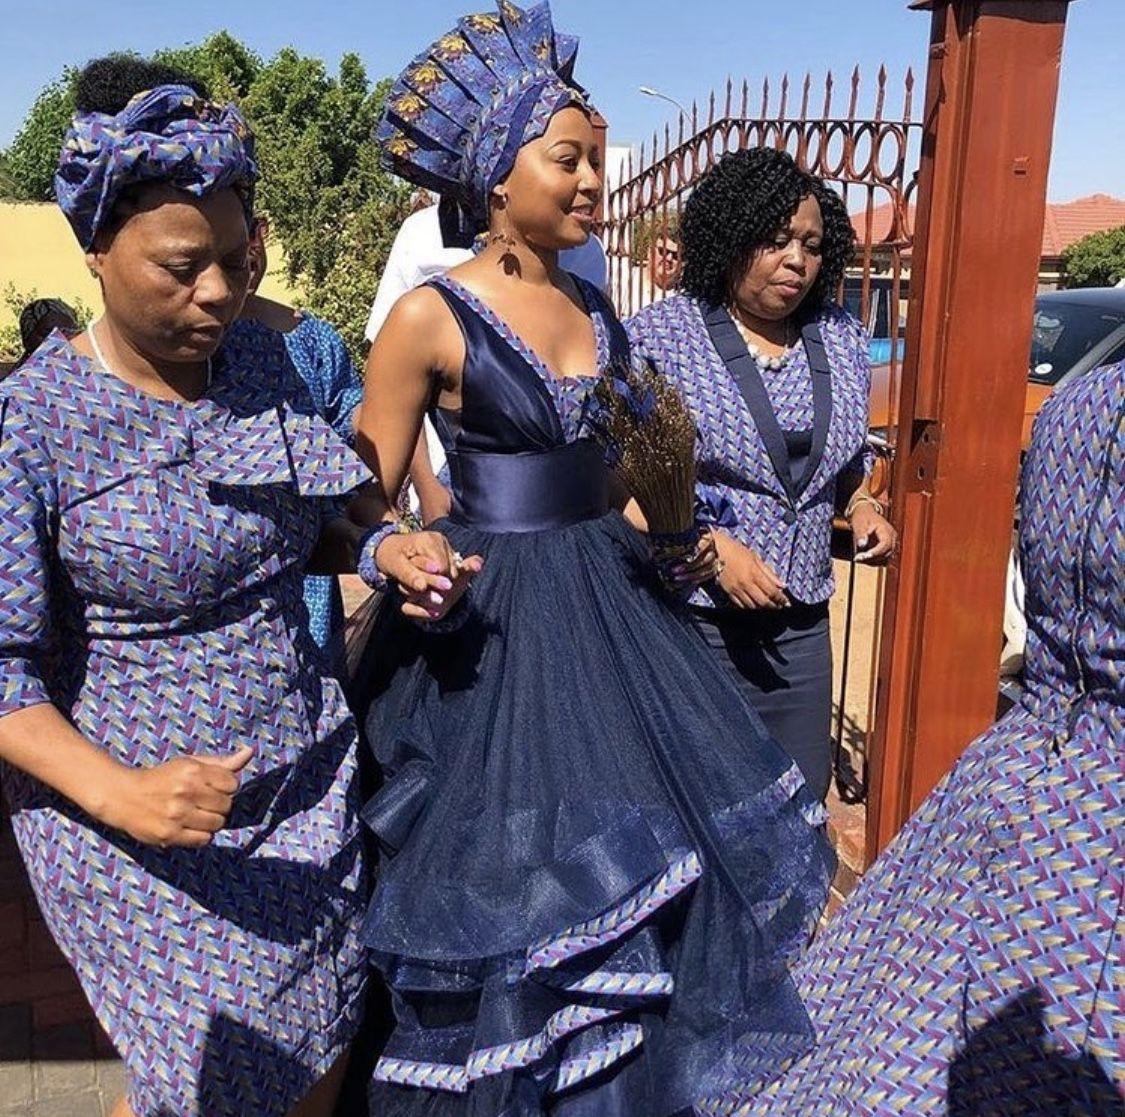 Tswana Wedding In 2019